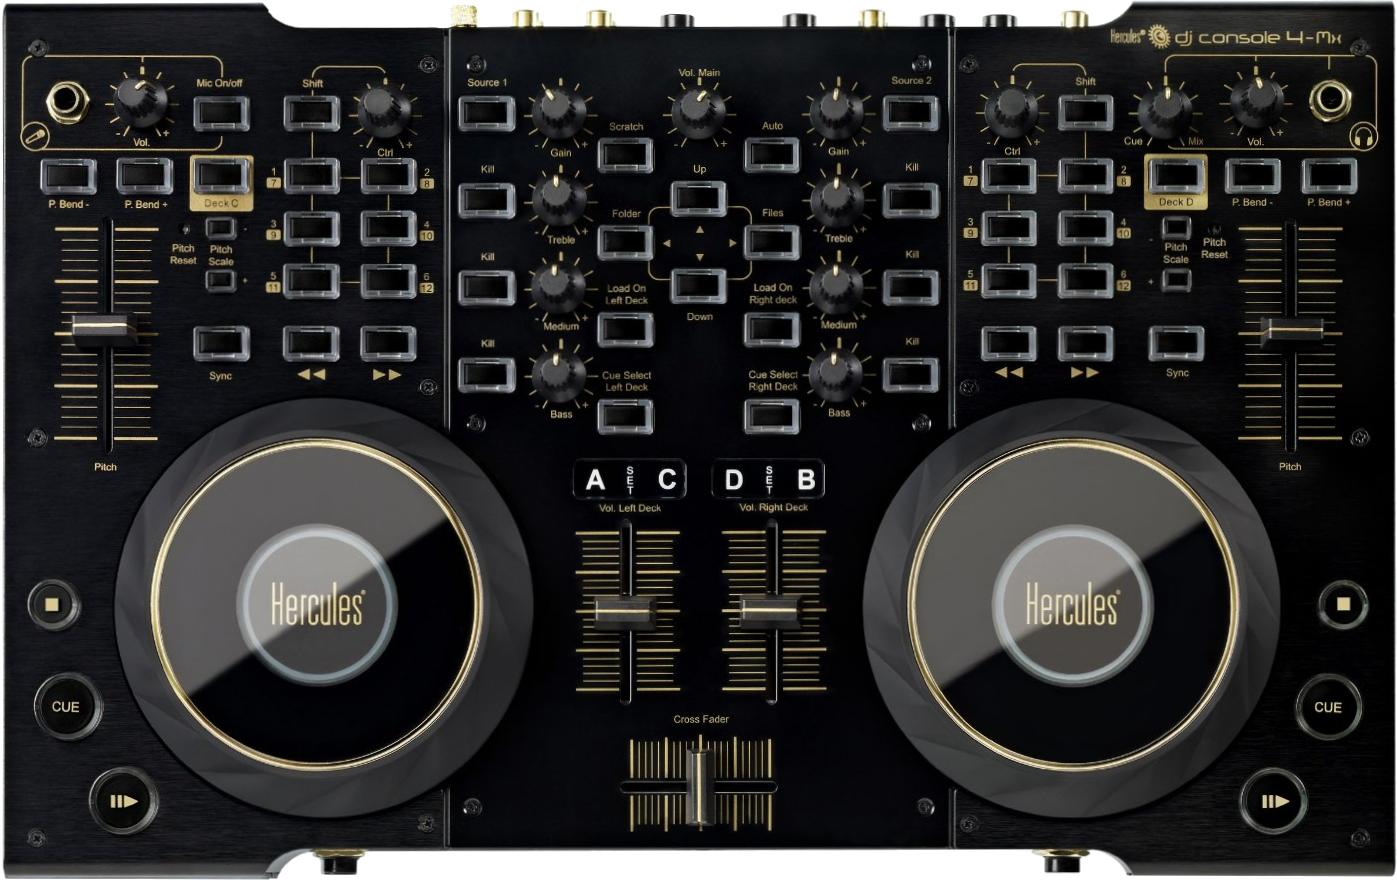 Hercules DJ Console 4 Mx Black